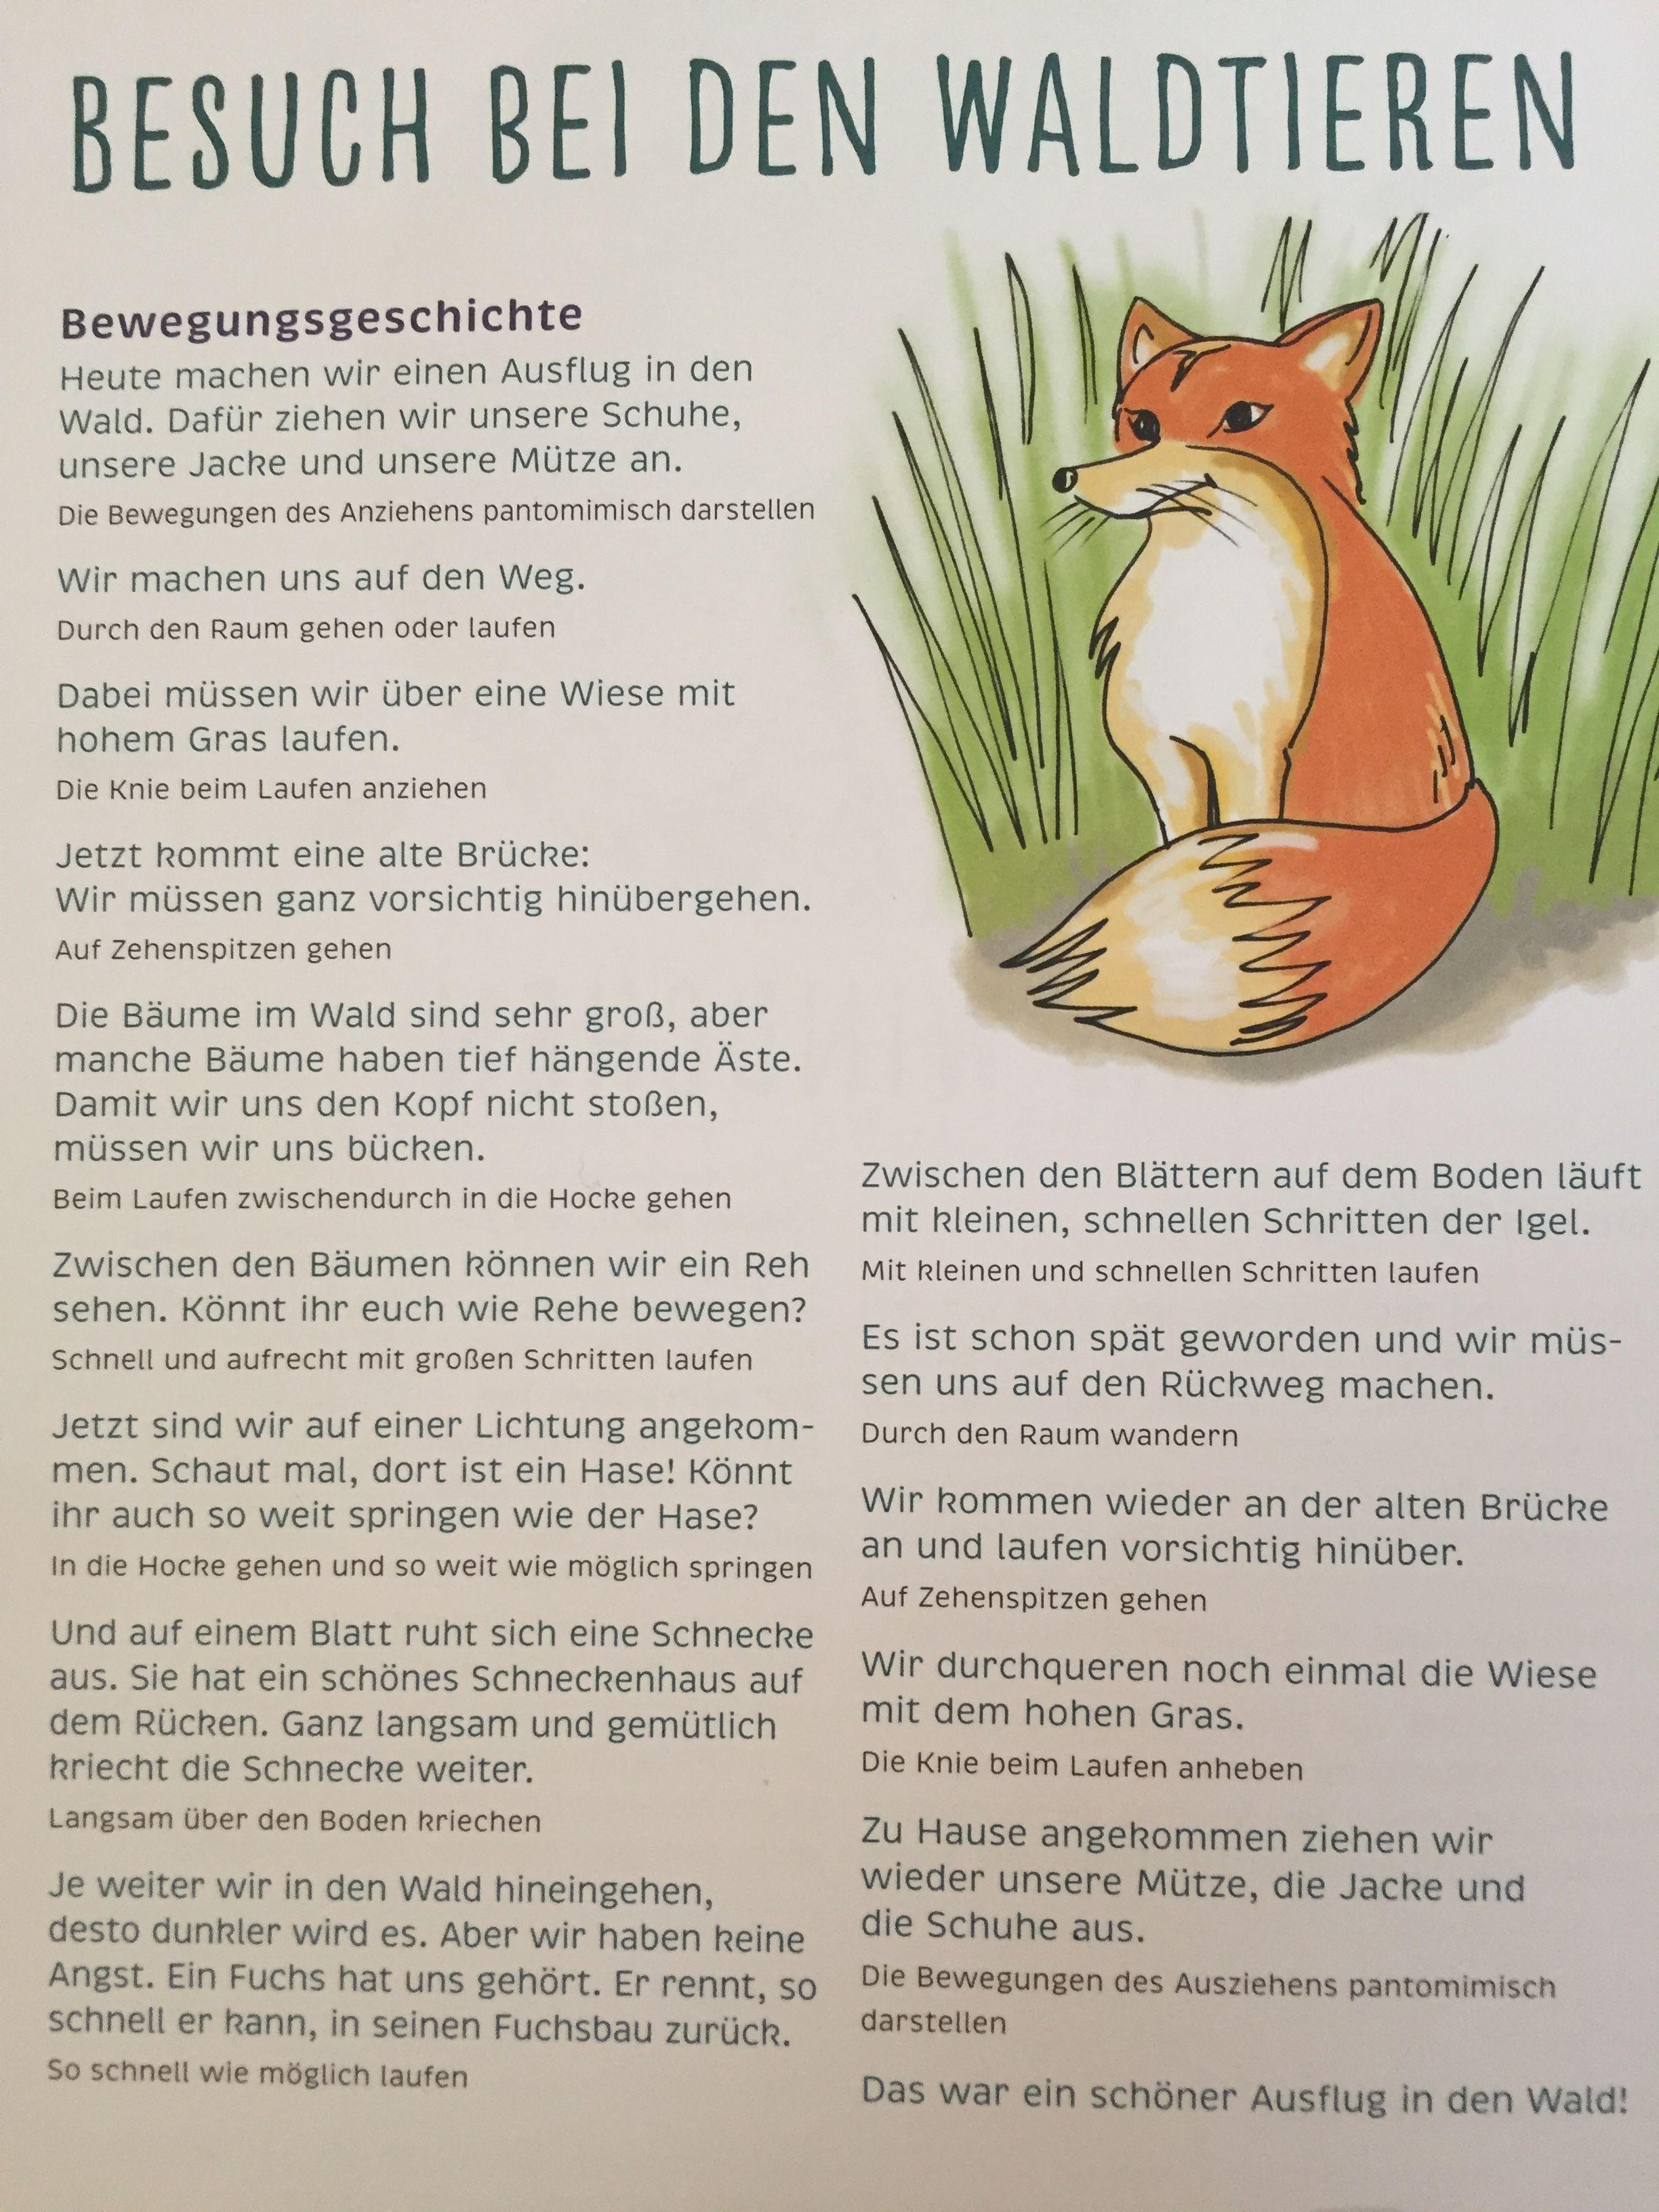 Bewegungsgeschichte Wir gehen in den Wald  | Jzyk ...